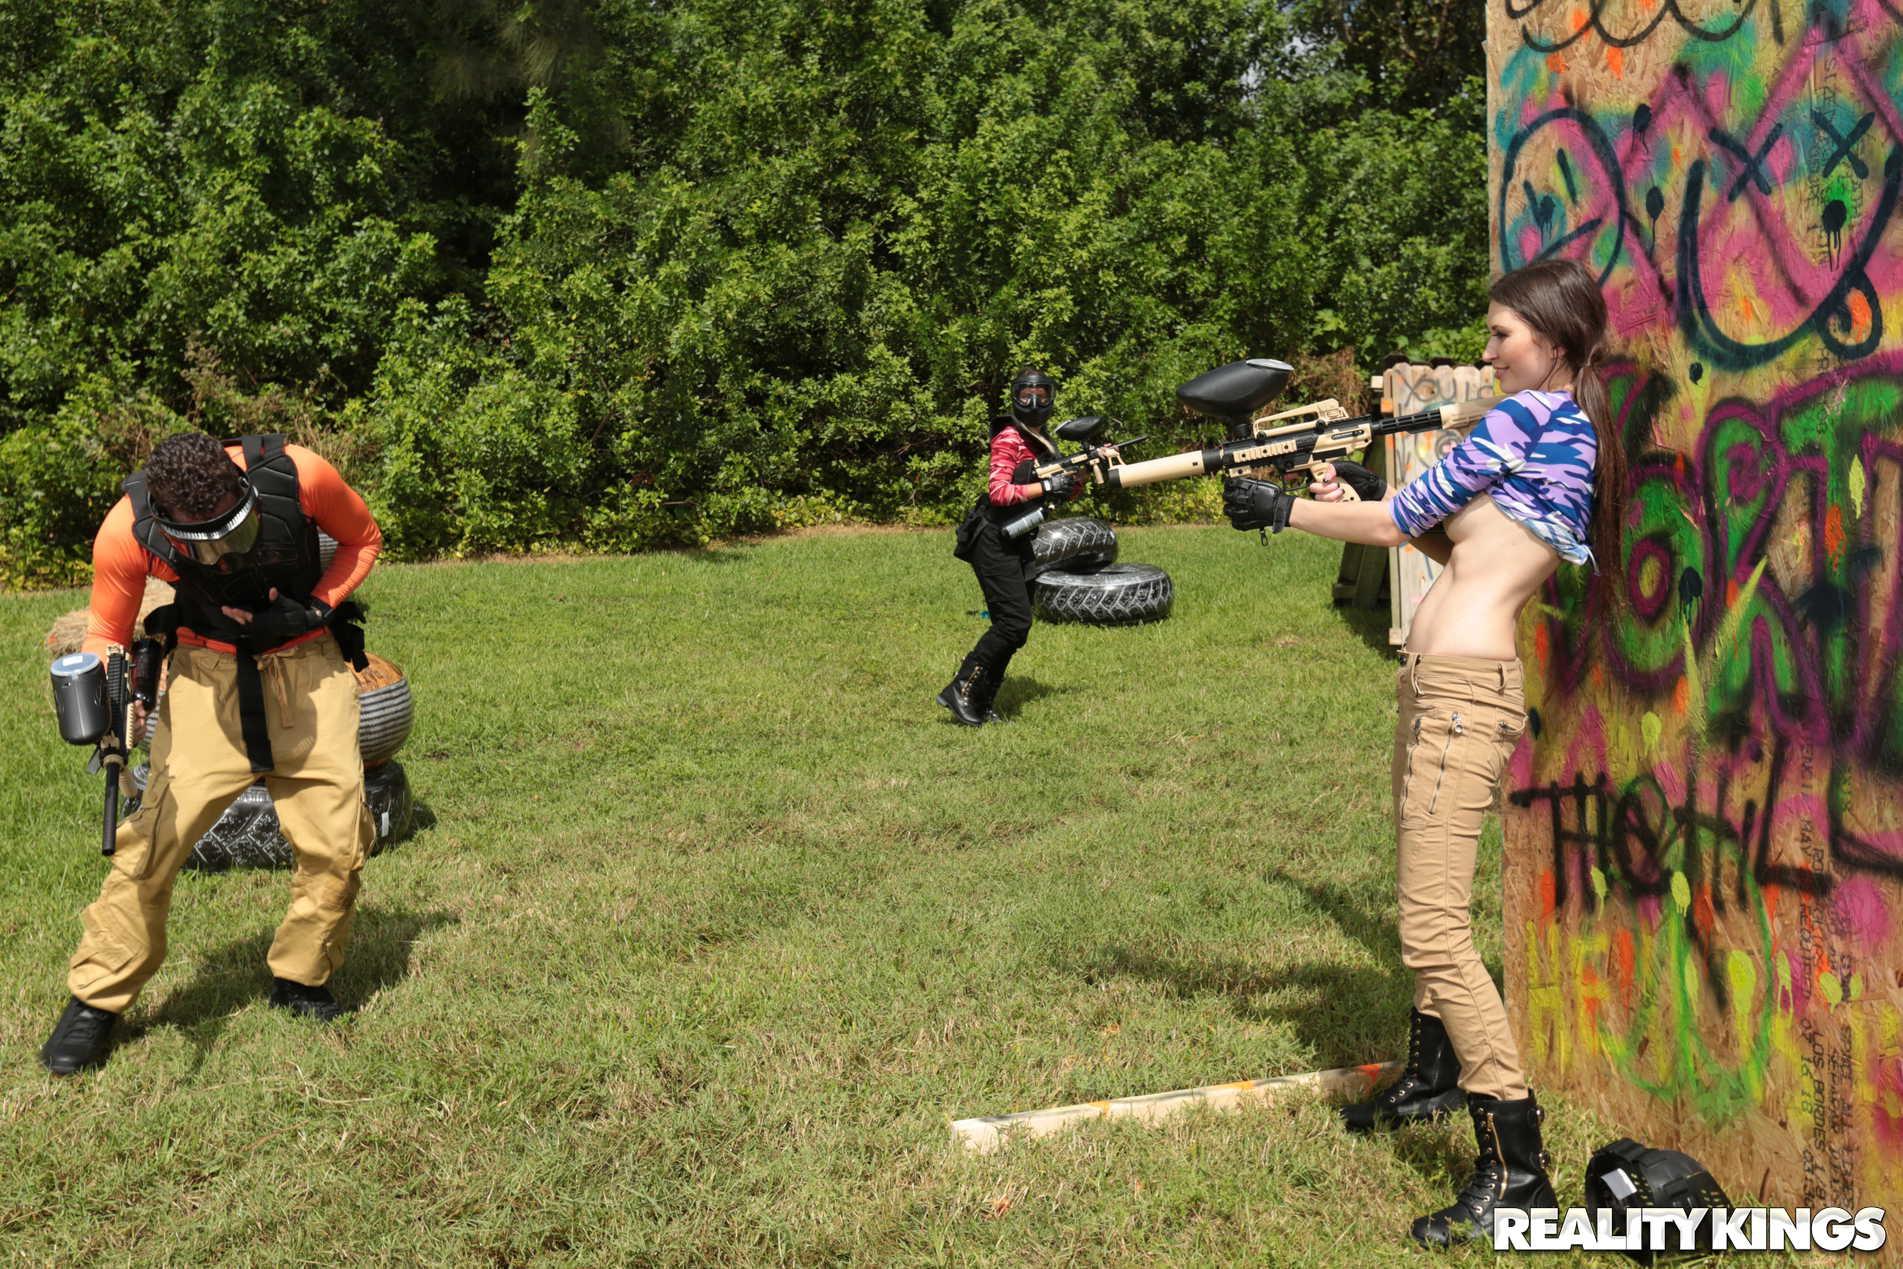 Reality Kings 'Battle Royale' starring Angelina Diamanti (Photo 72)